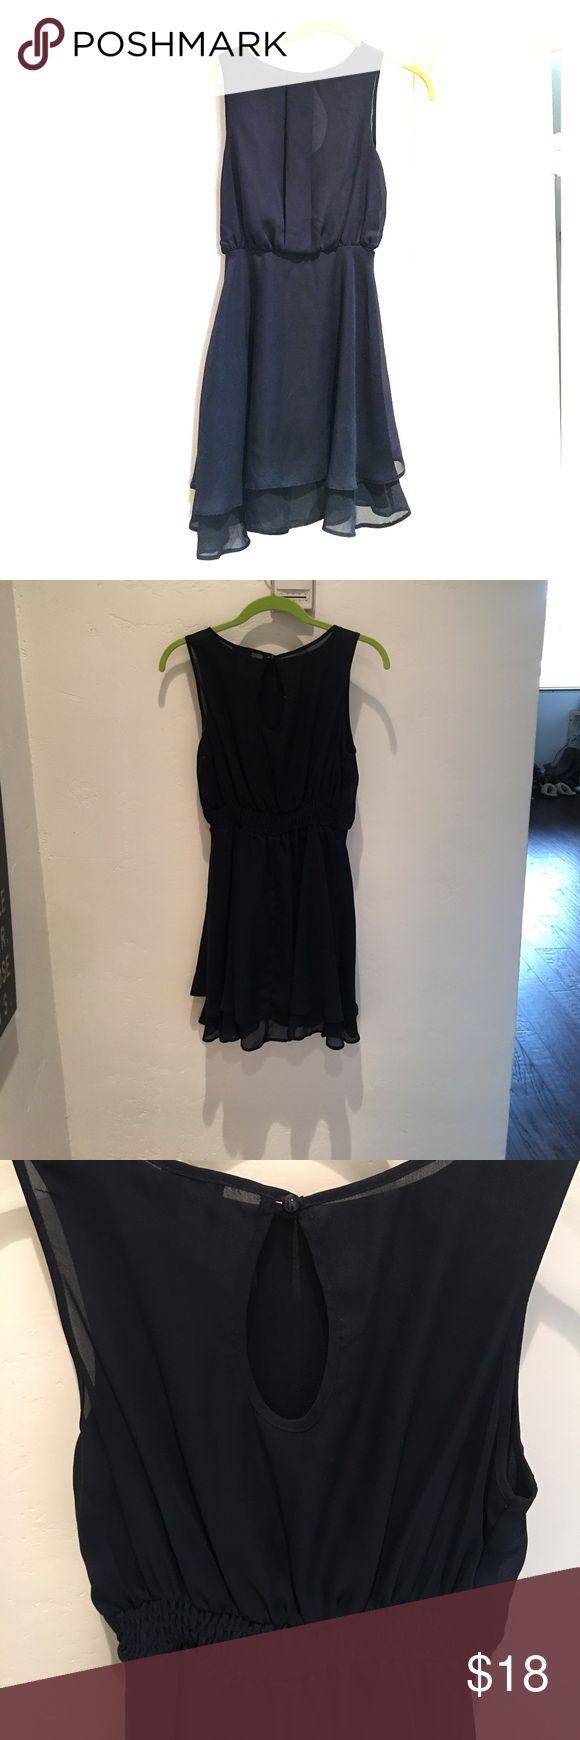 ASOS | Navy Chiffon Dress Beautiful navy chiffon dress. Great for any occasion. 34 inches long falls above the knee. ASOS Dresses Midi